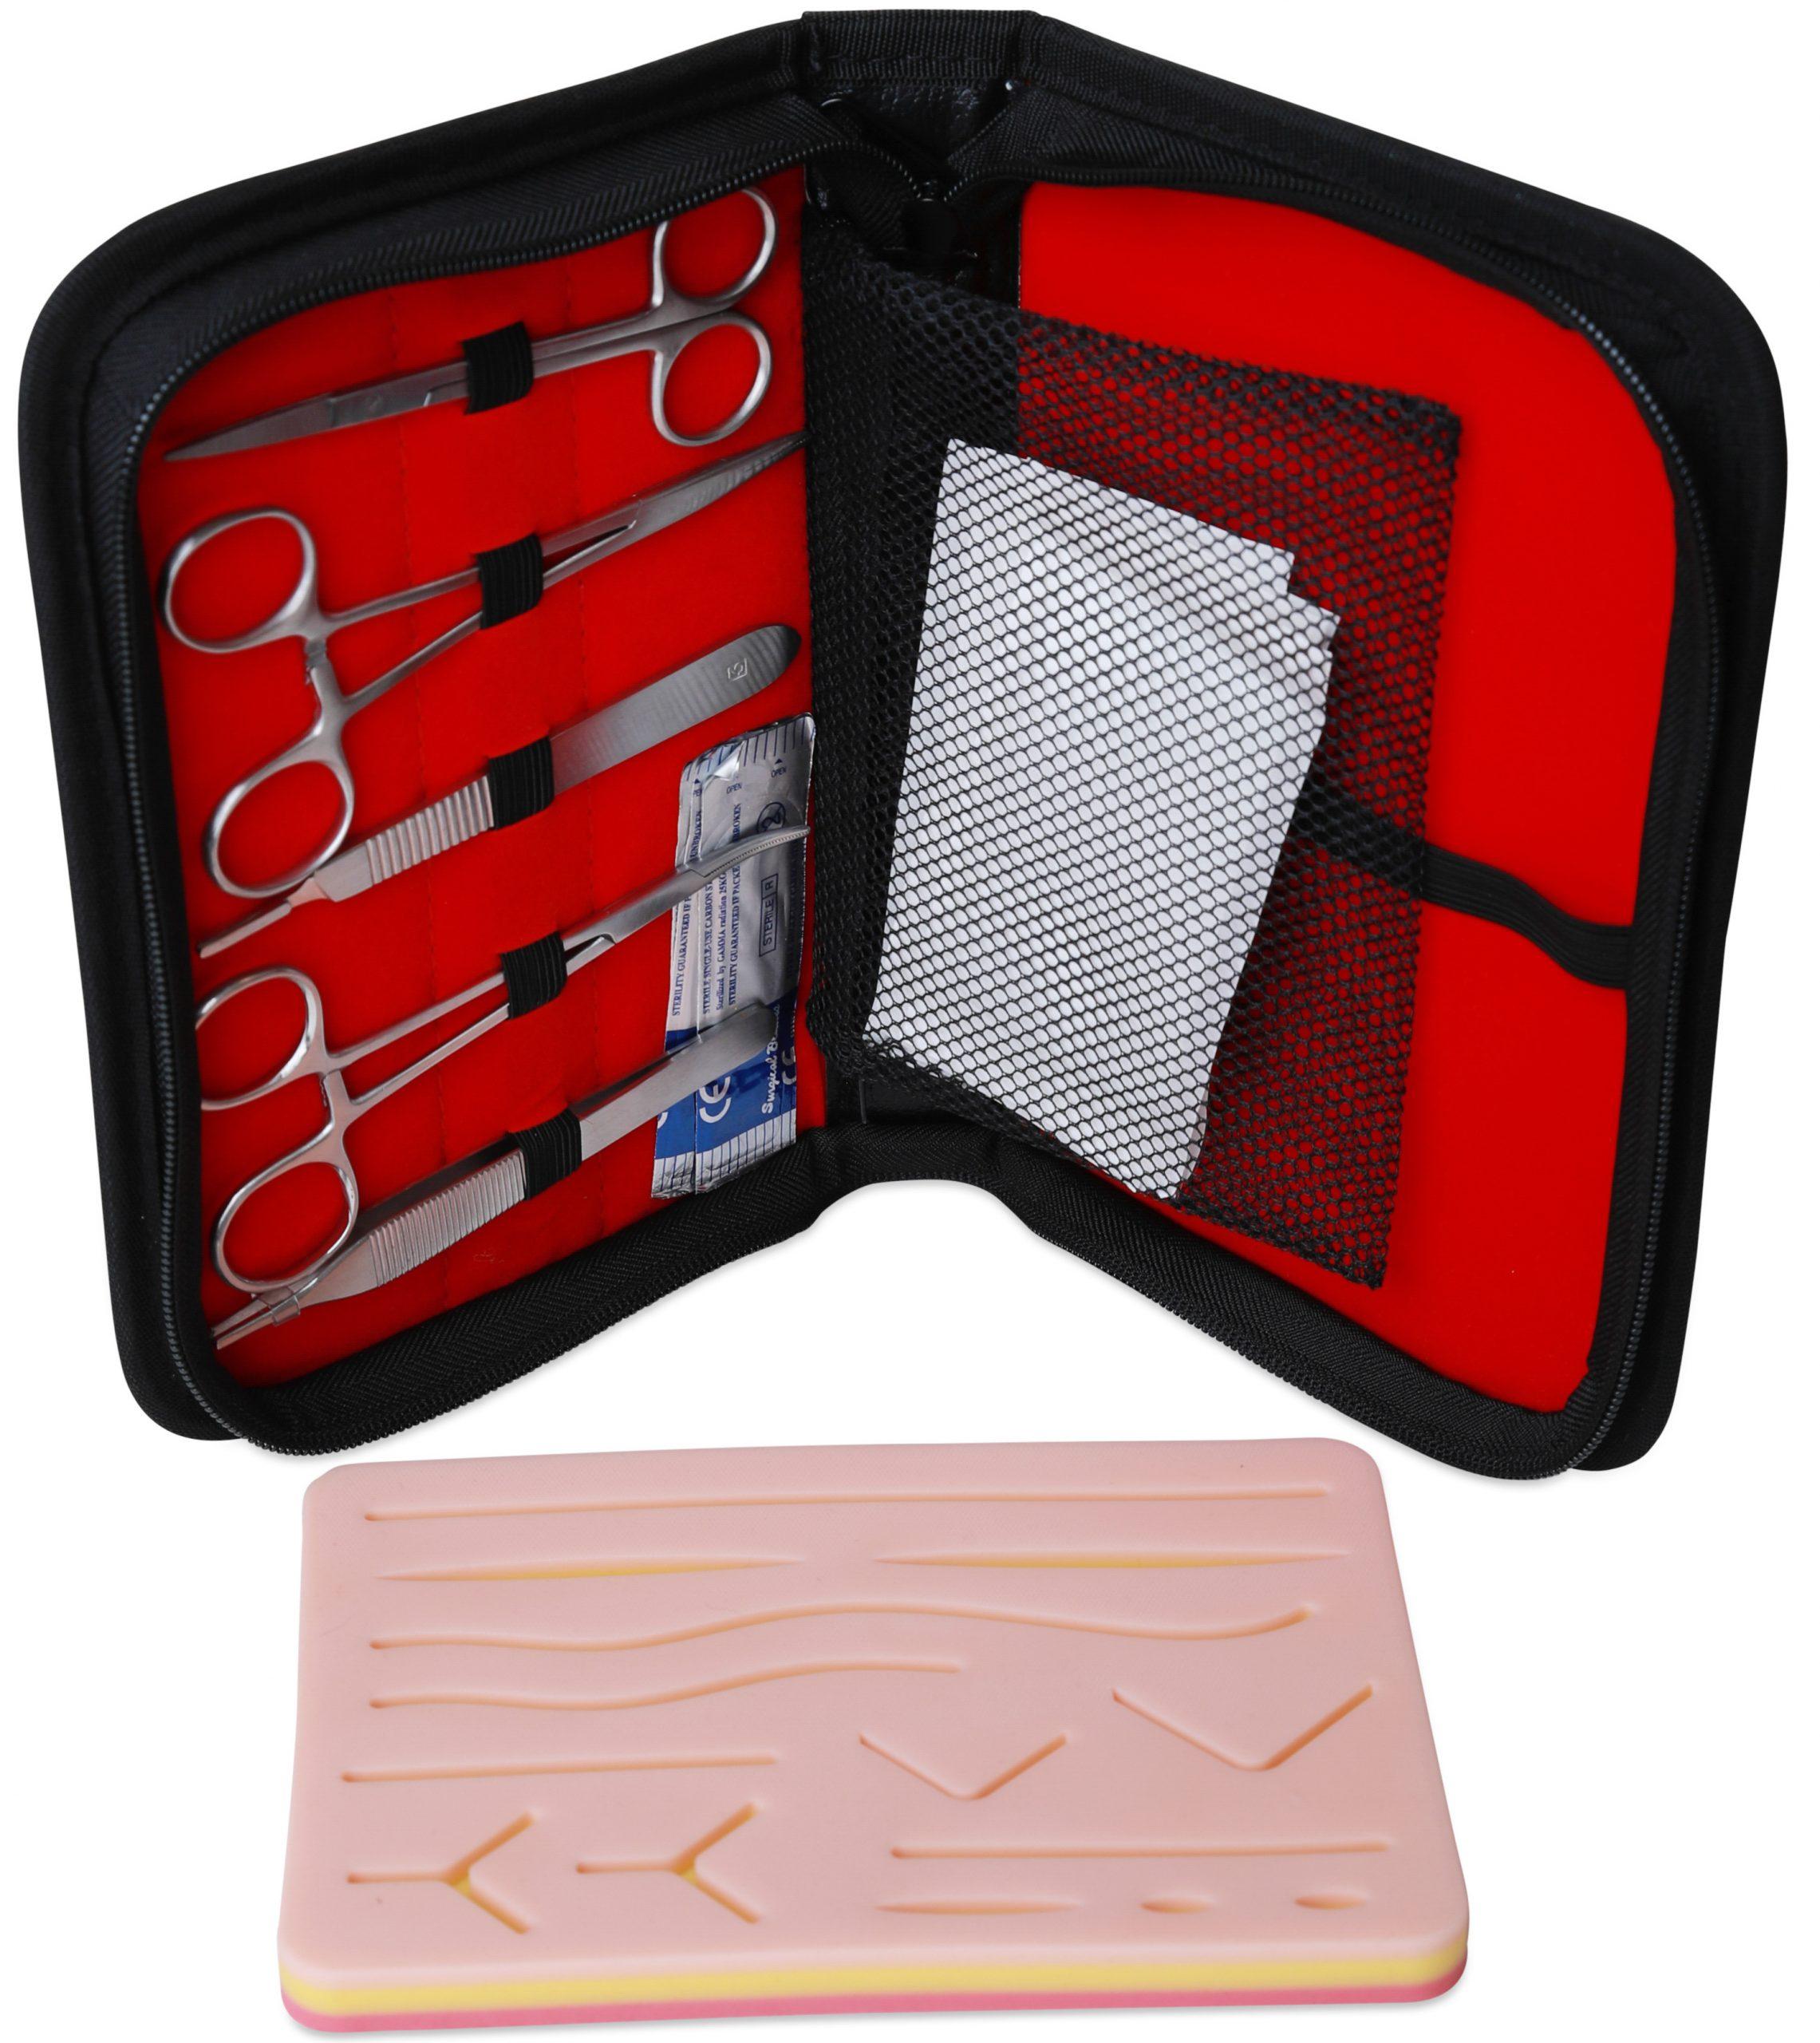 Suturkit-kirurgi-trene-på-suturering-cingulum